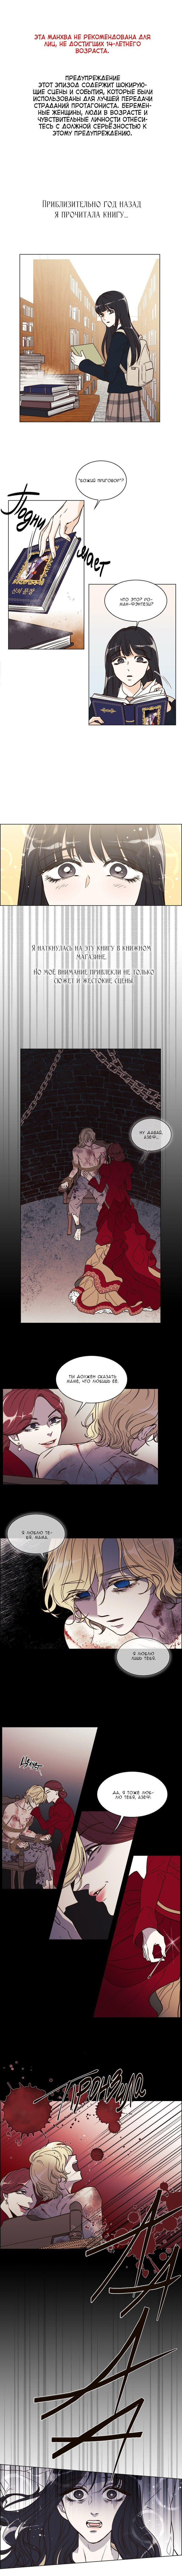 Манга Спасительница злодея - Глава 3 Страница 1